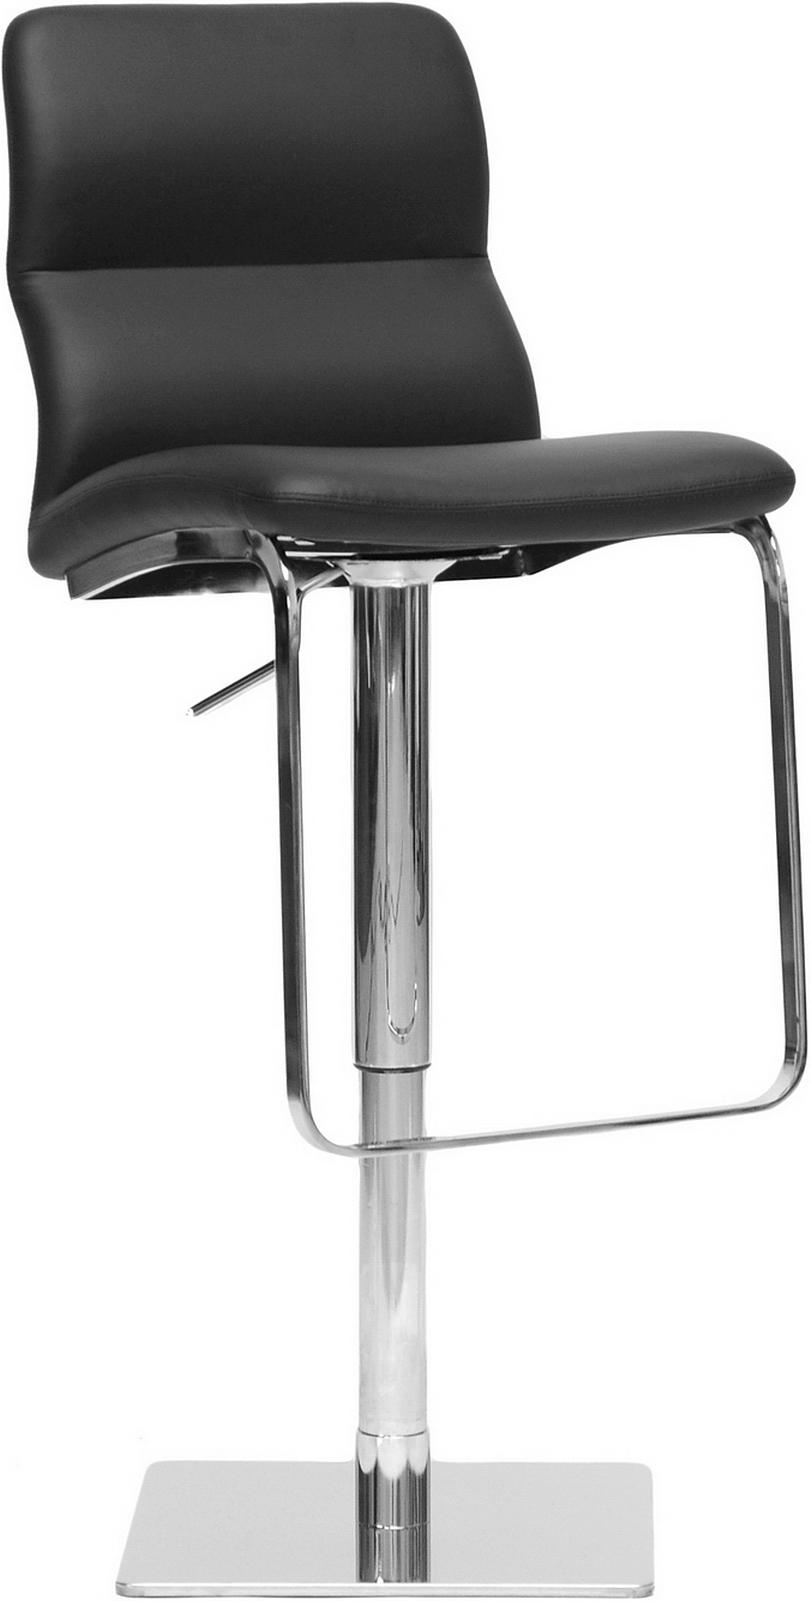 the helsinki bar stool in black